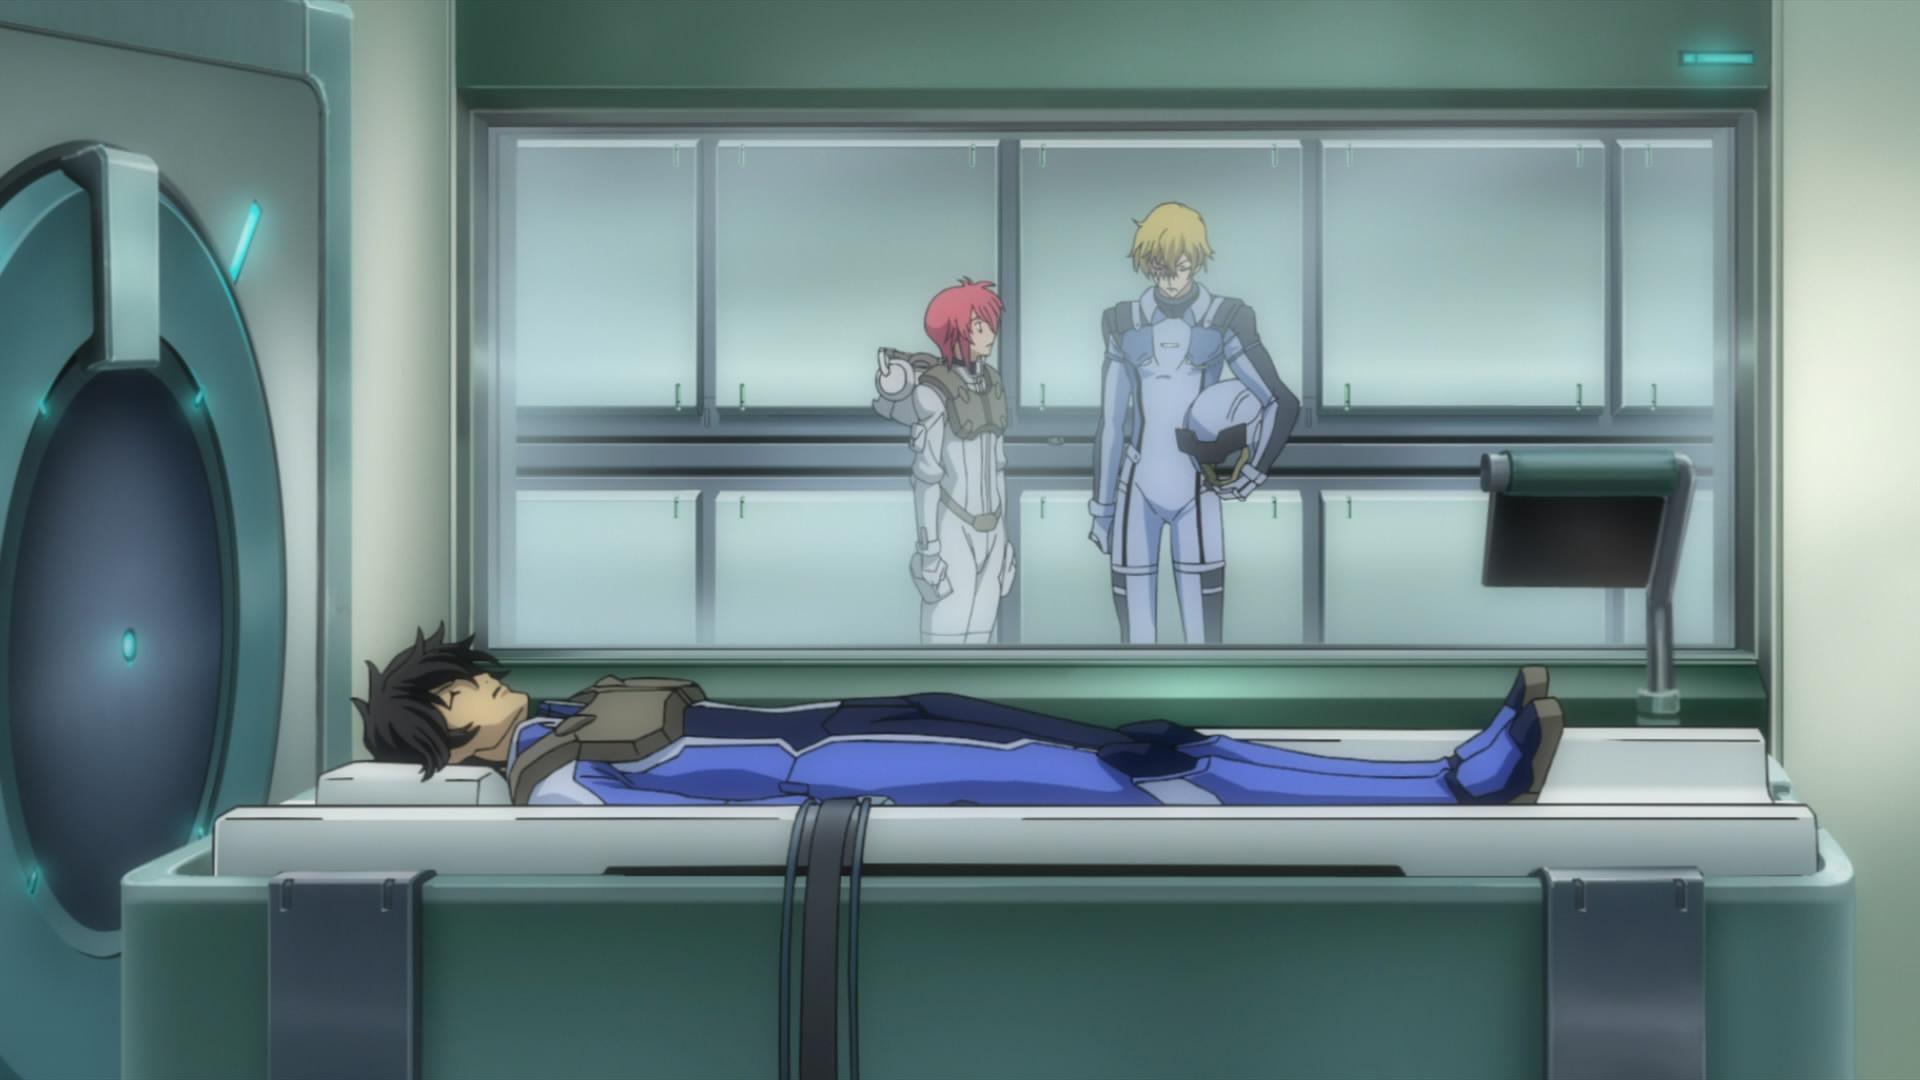 [gSS]_Mobile_Suit_Gundam_00_-_A_wakening_of_the_Trailblazer_(1080p)_[2B252856].mkv_snapshot_01.16.36_[2011.01.07_04.41.09]